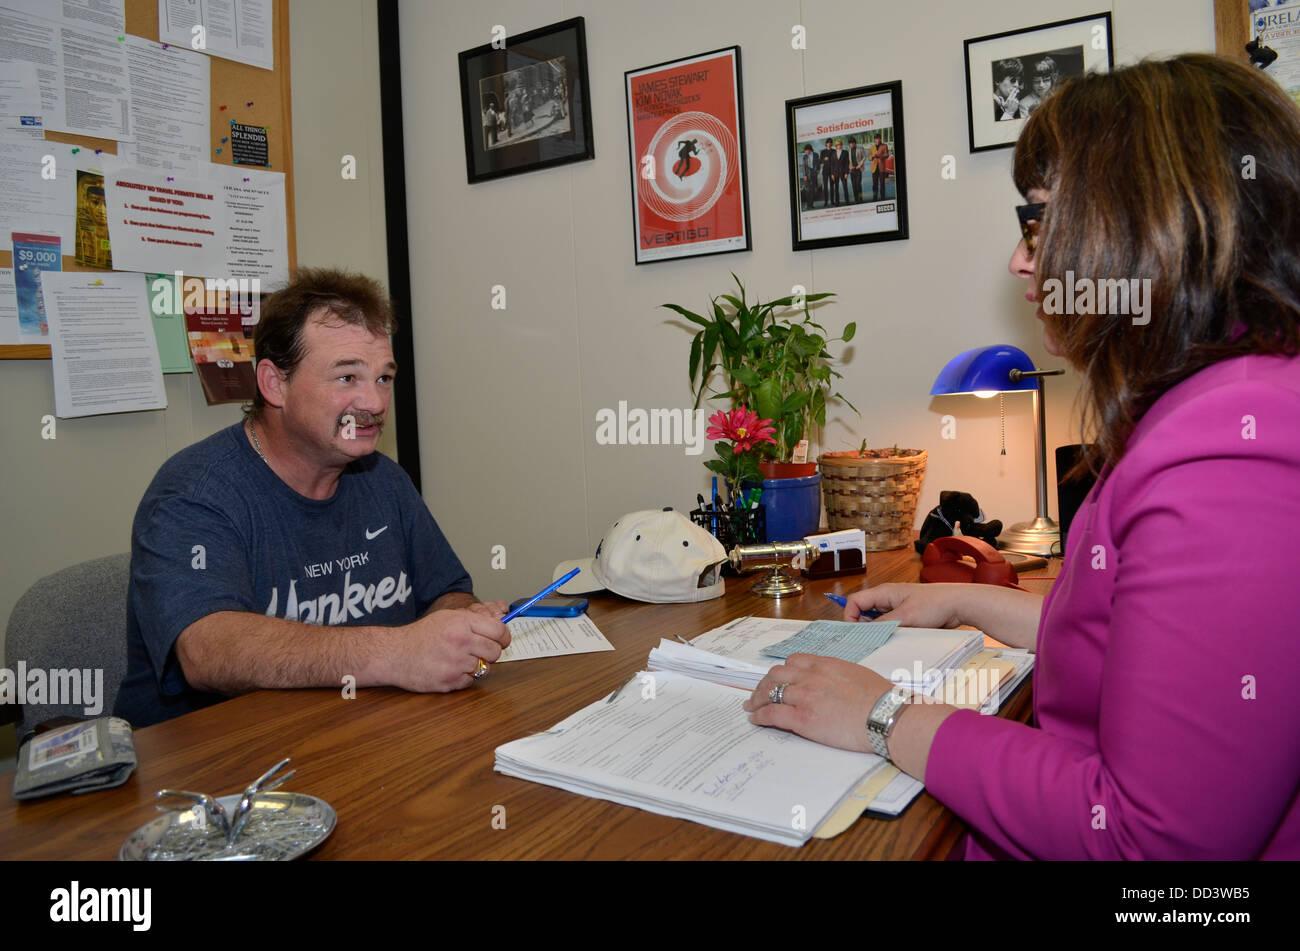 Male parolee meeting with female parole officer. Adult Parole in Omaha, Nebraska, USA. - Stock Image